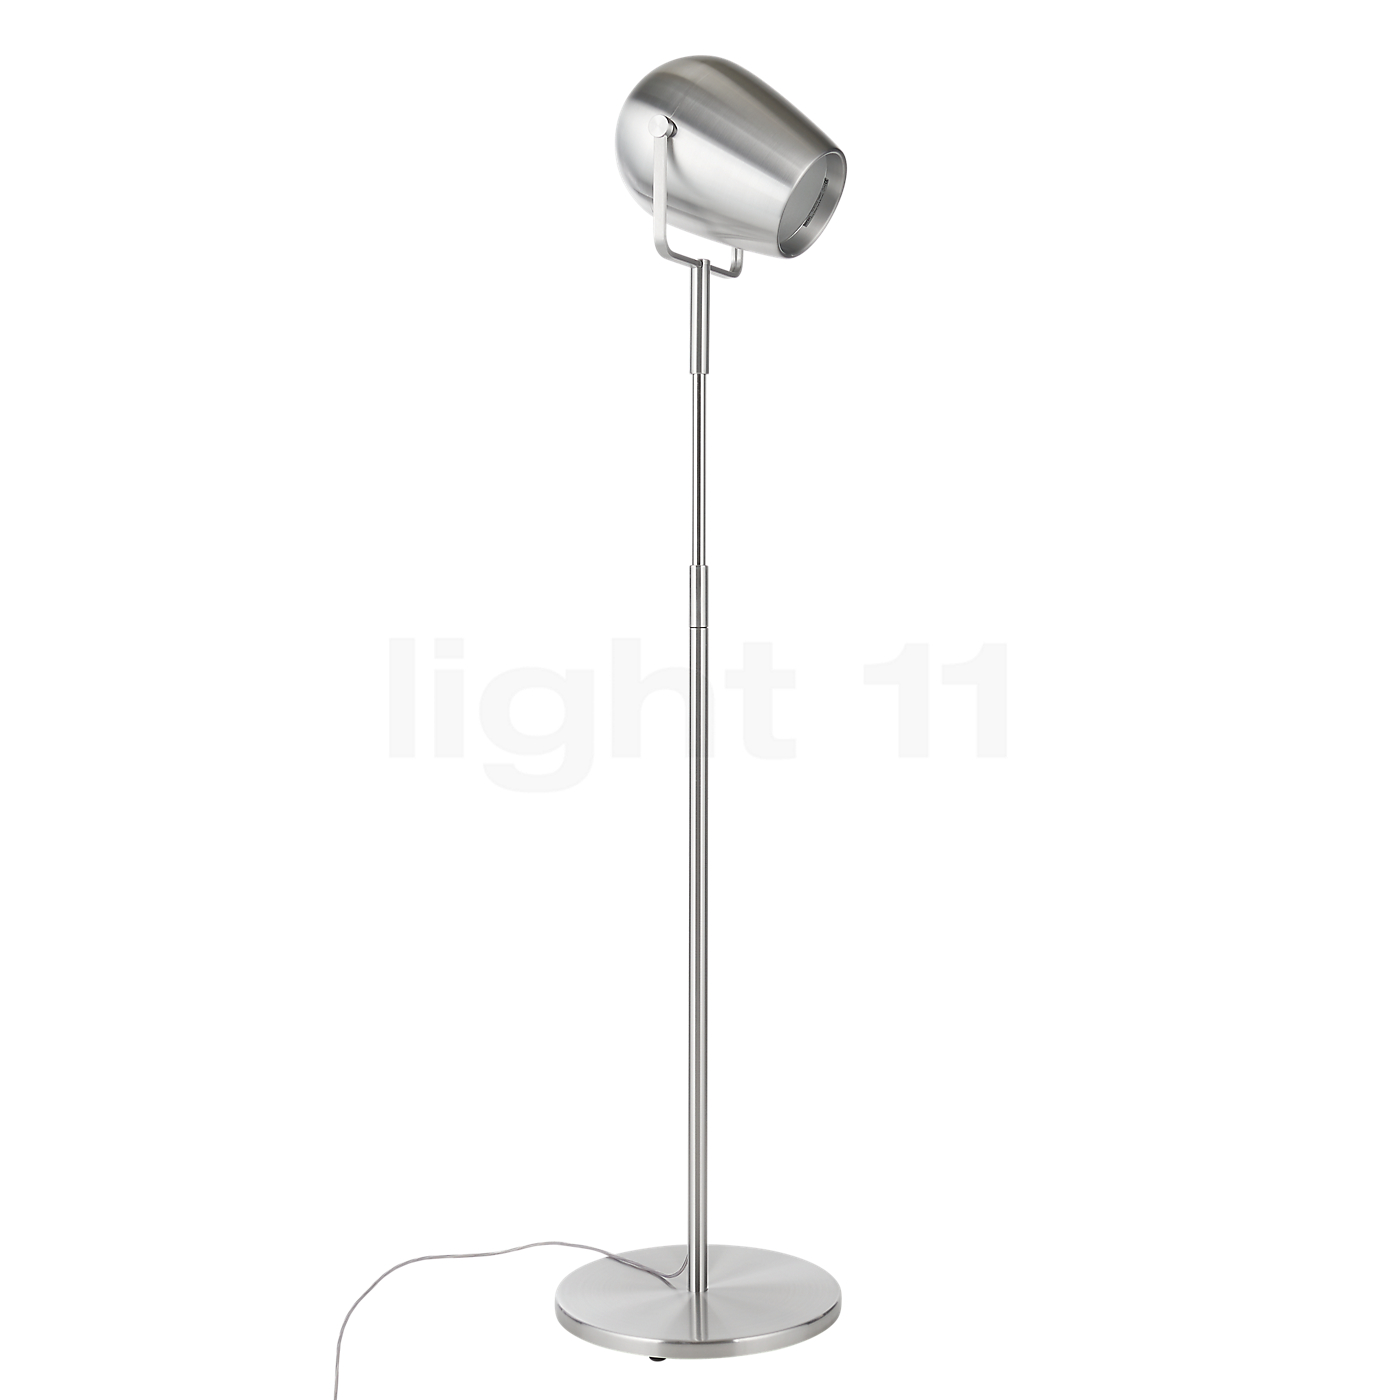 serien lighting pan am floor led buy at. Black Bedroom Furniture Sets. Home Design Ideas